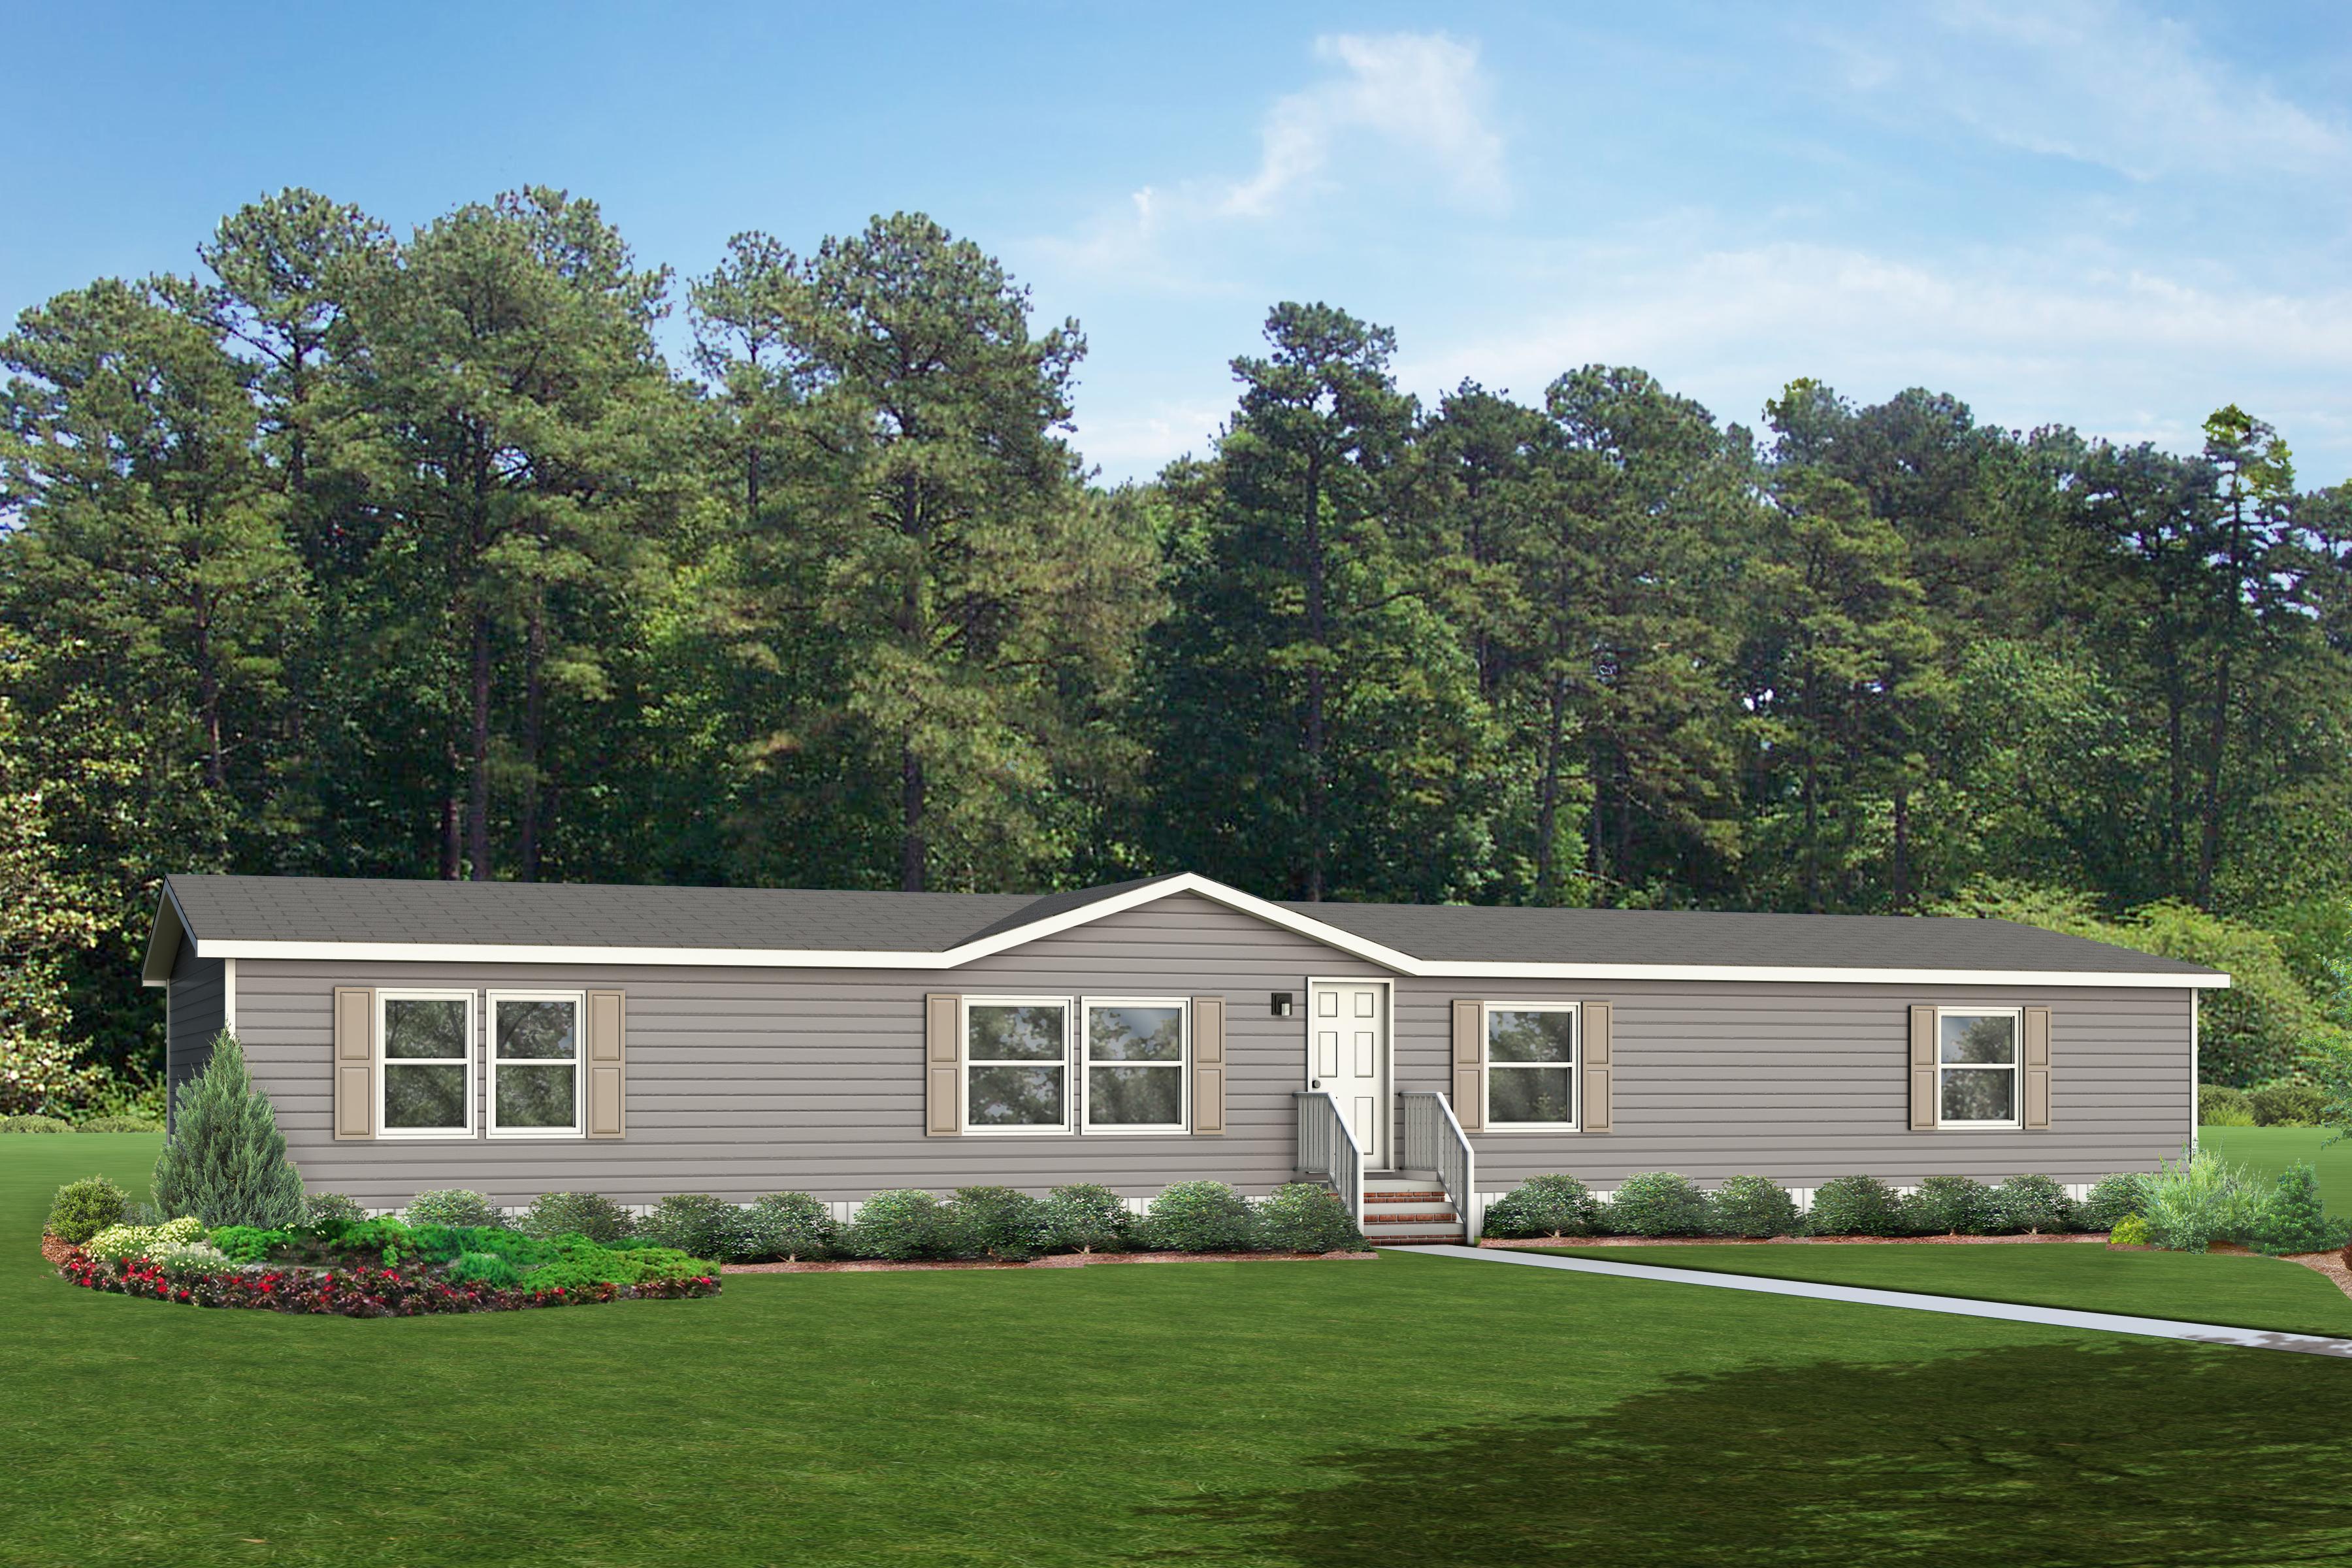 Clayton Homes In Lake Charles La Prefabricated